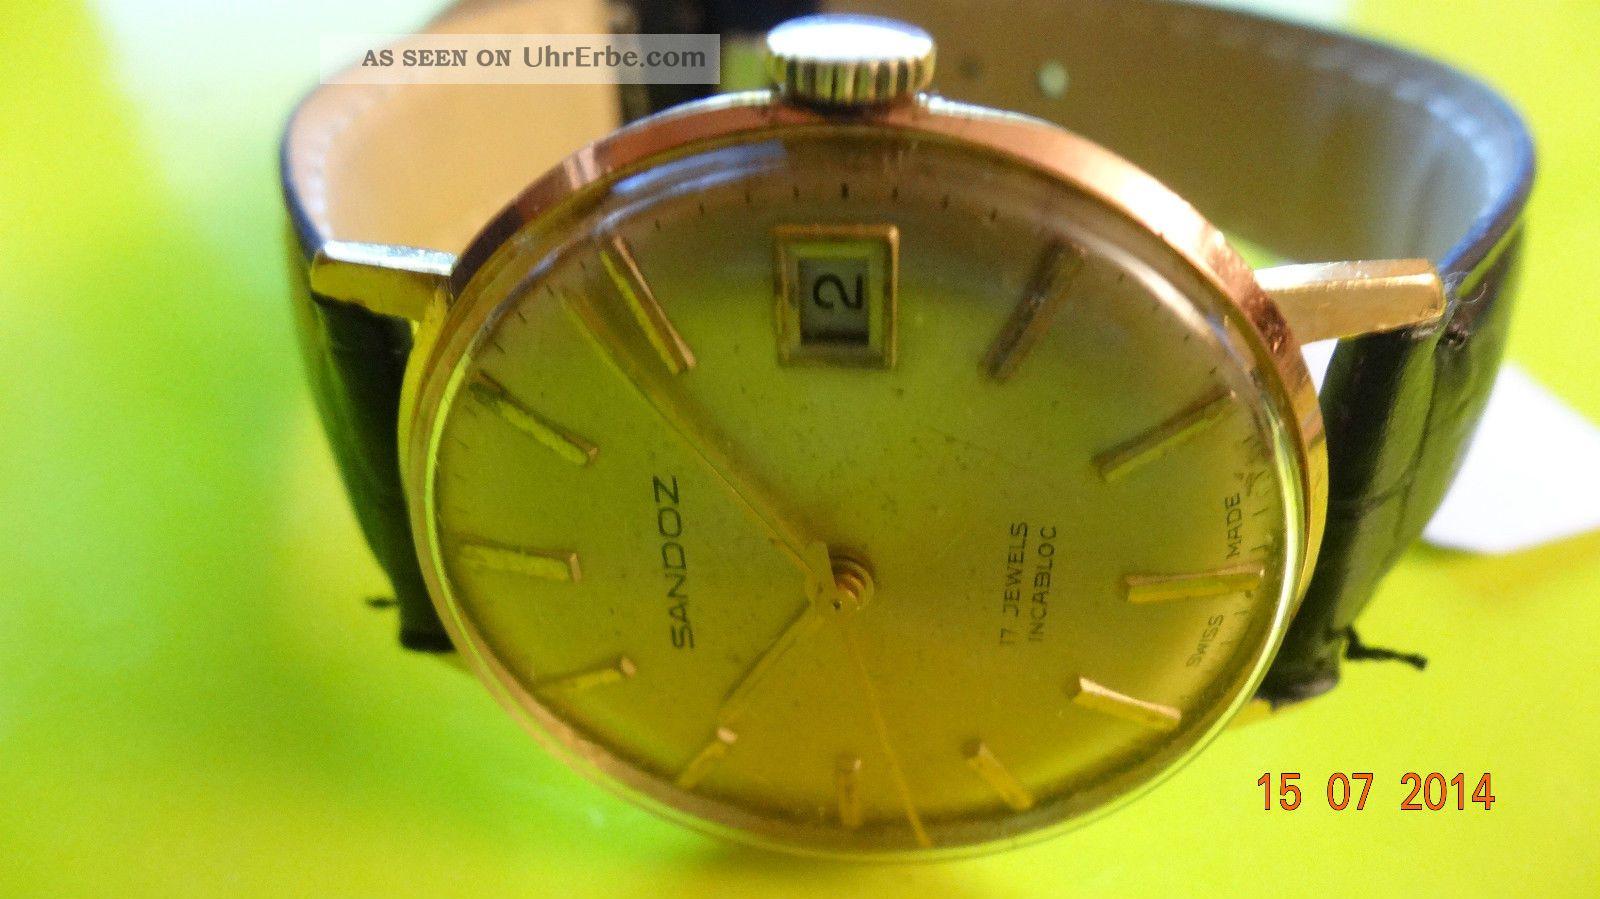 Vintage Rare Henri Sandoz & Fils Golden Plated Incabloc 17 J Cal.  Fhf St 96 - 4 Armbanduhren Bild